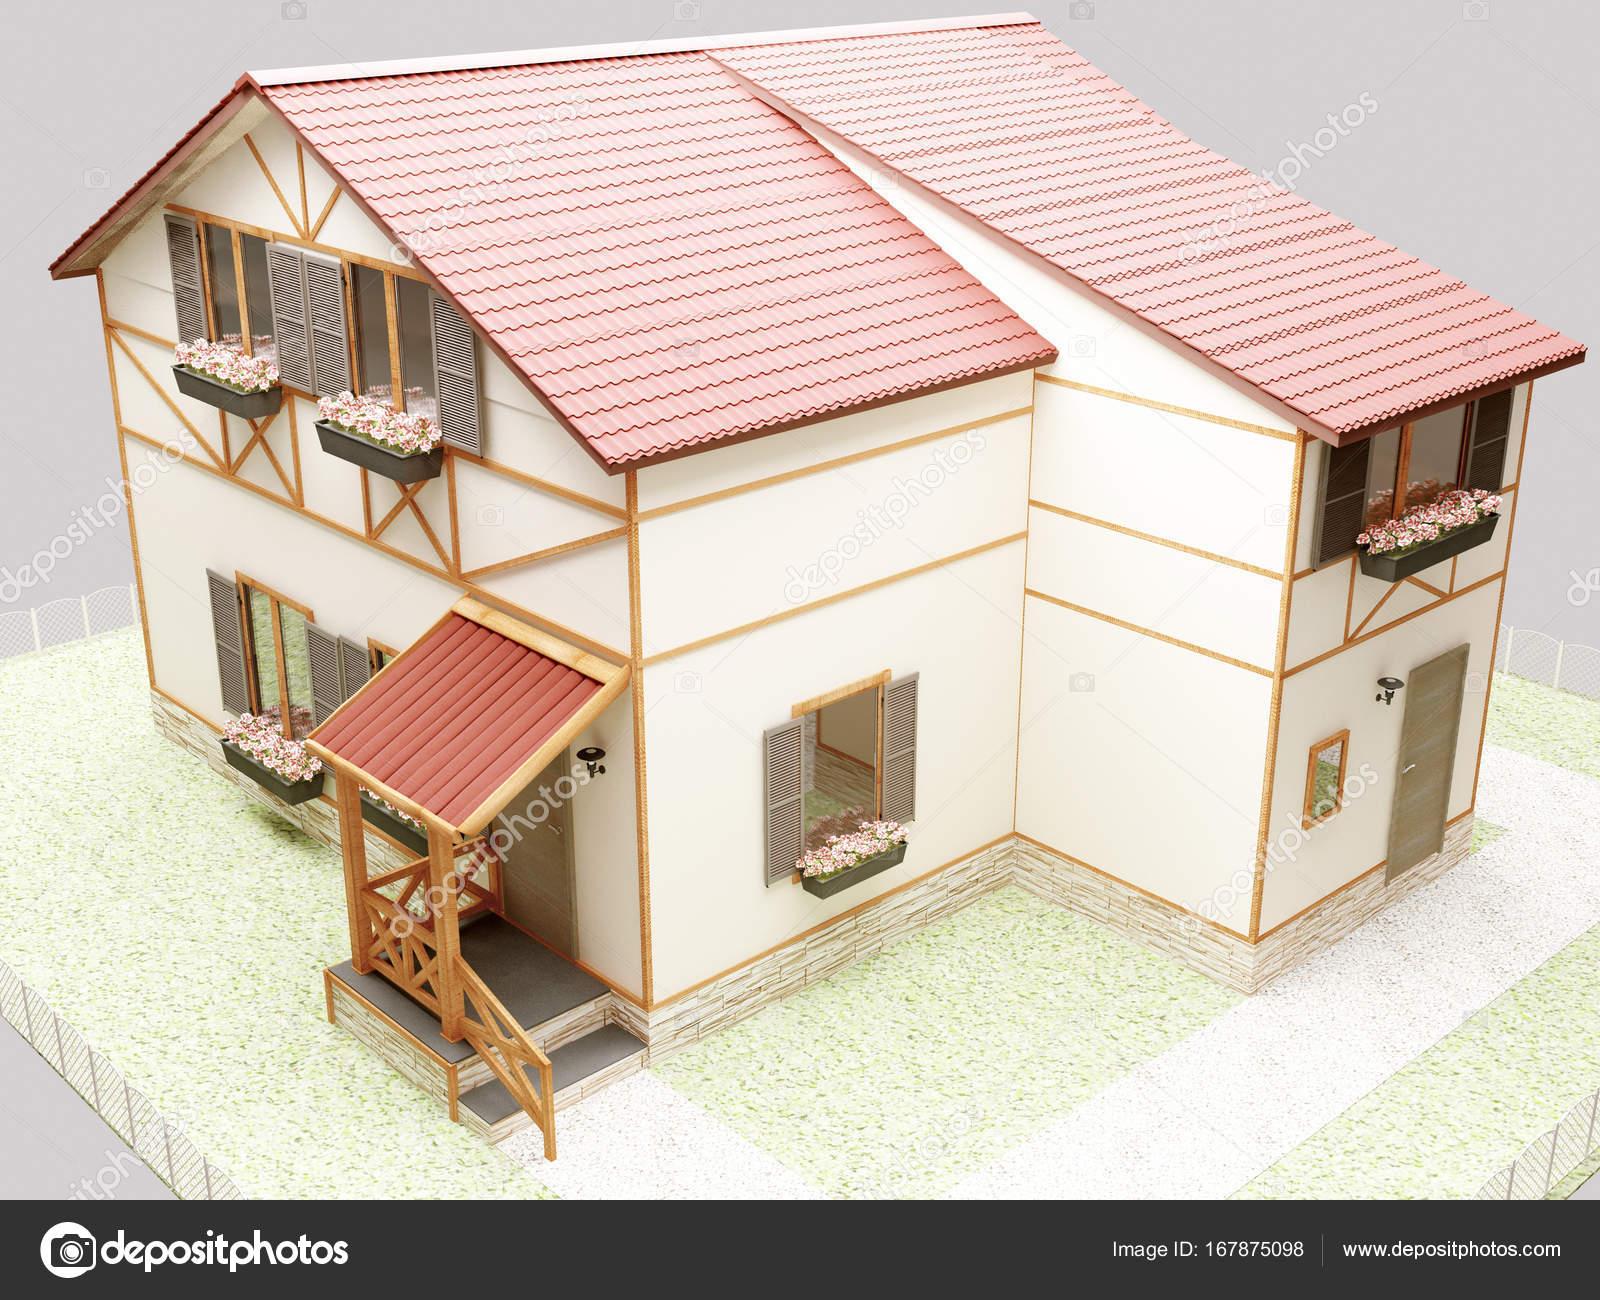 Mooi huis in moderne stijl 3d u2014 stockfoto © minerva86 #167875098